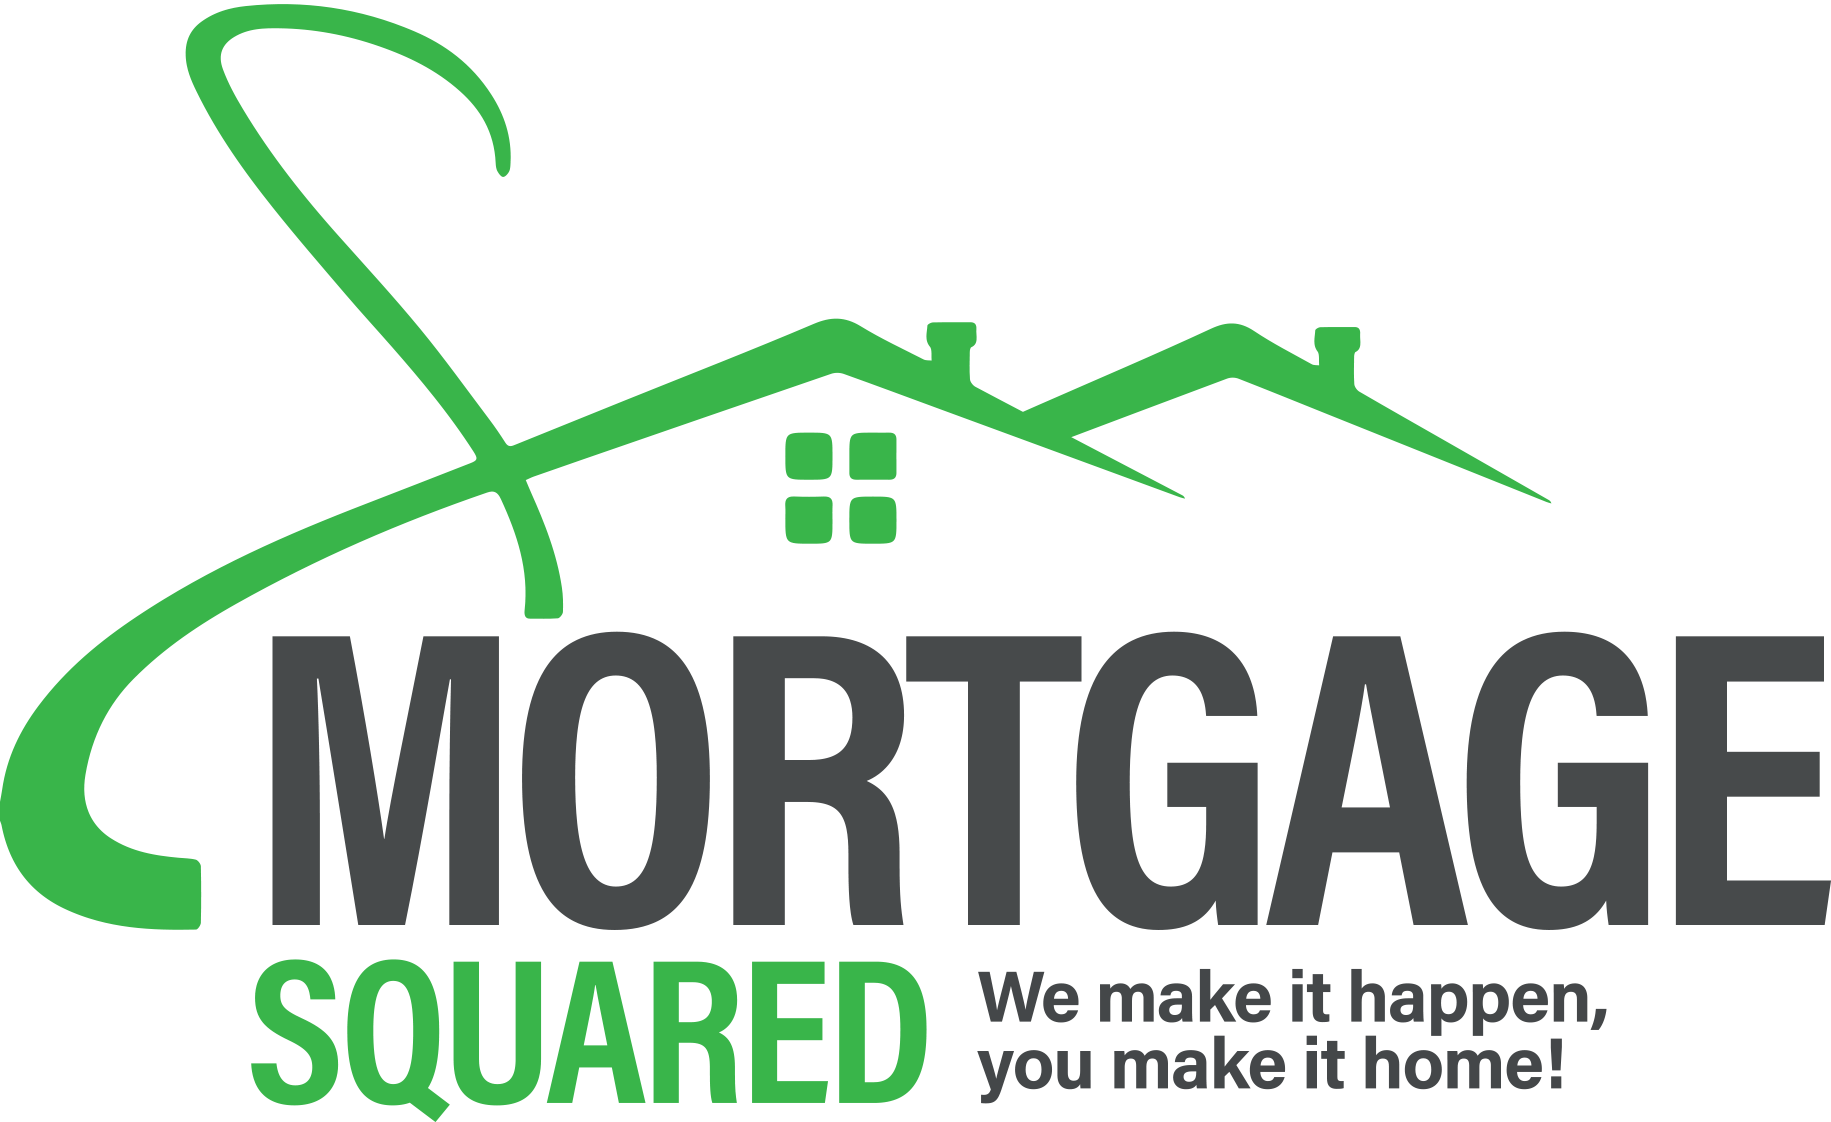 93217656 Morgage Squared logo floating